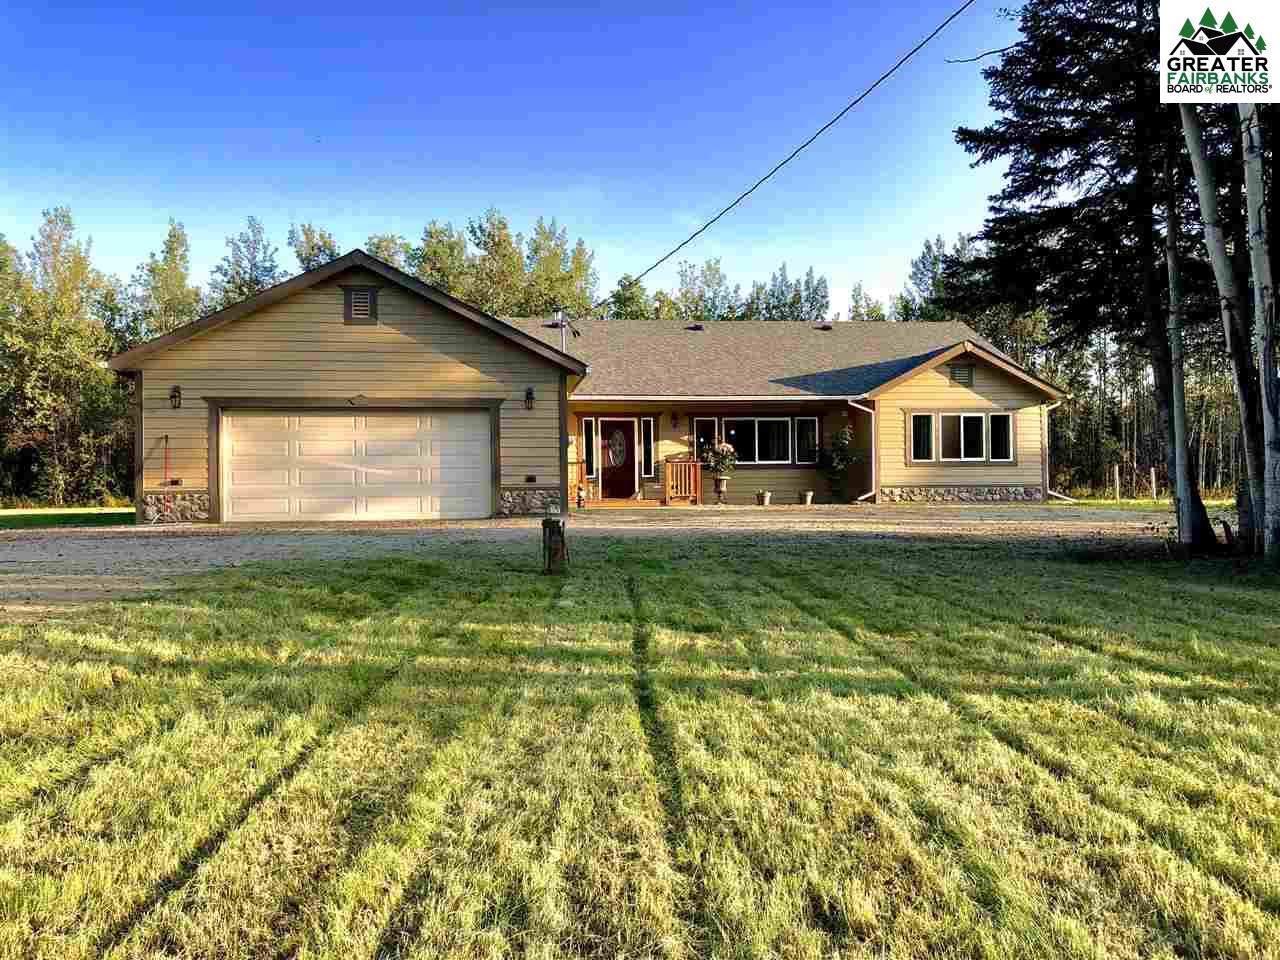 5145 Pugach Drive, Delta Junction, AK 99737 (MLS #136613) :: Madden Real Estate